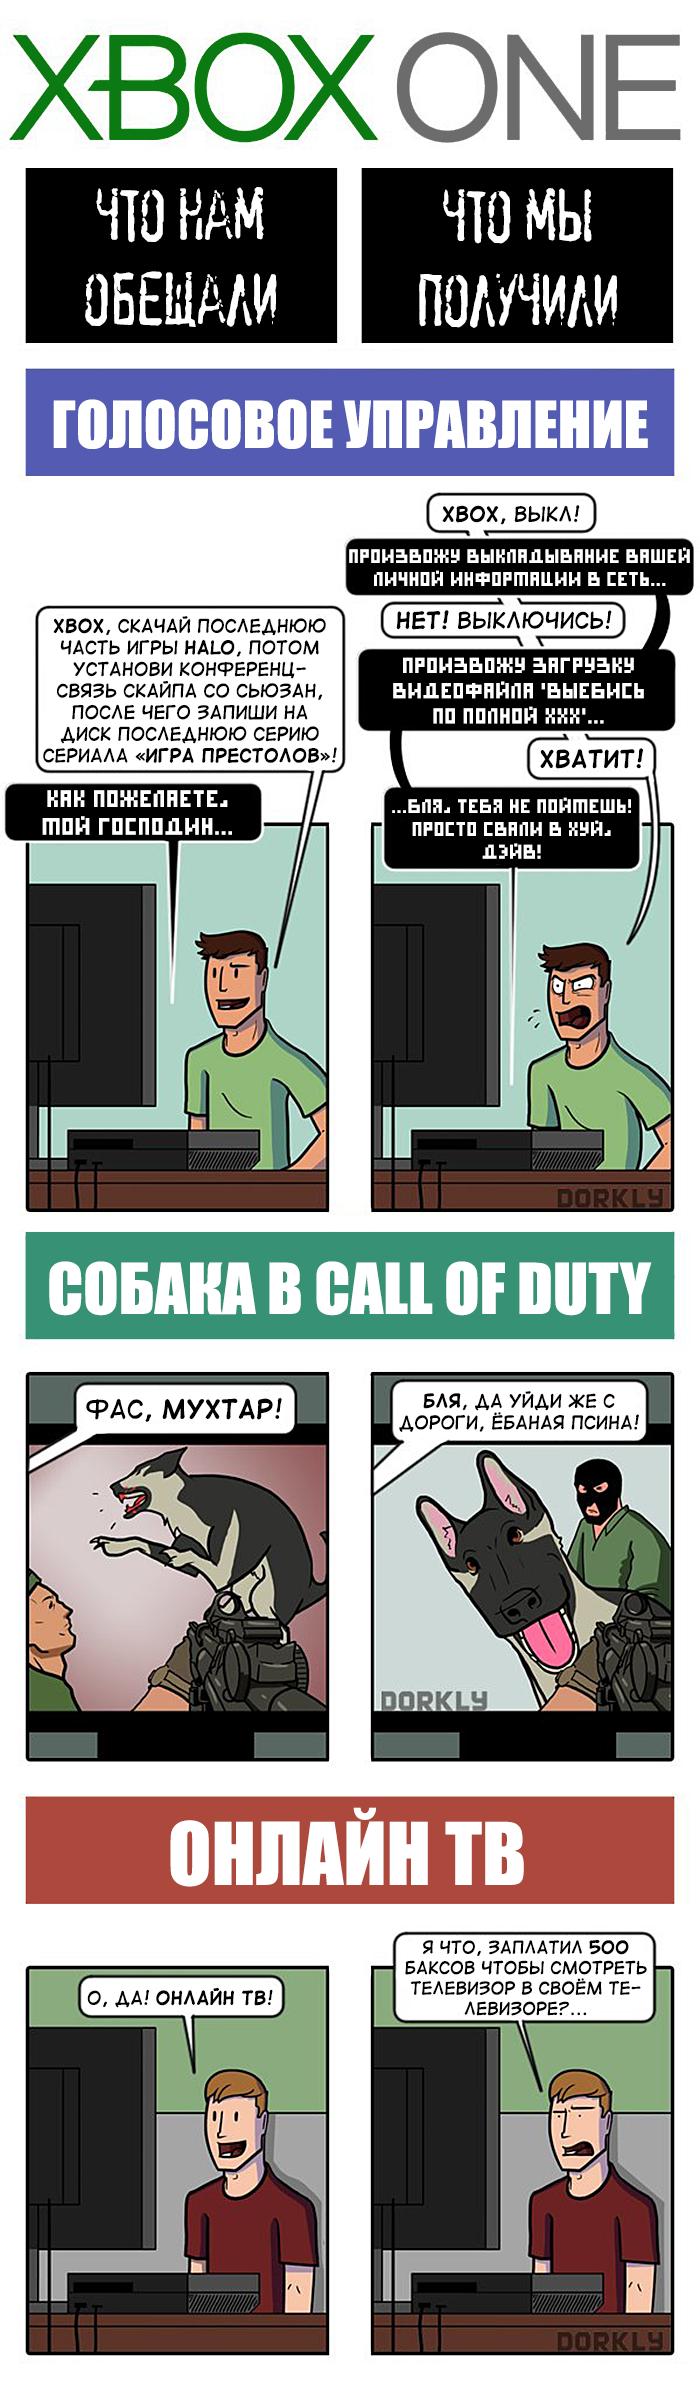 #XboxOne - Изображение 1